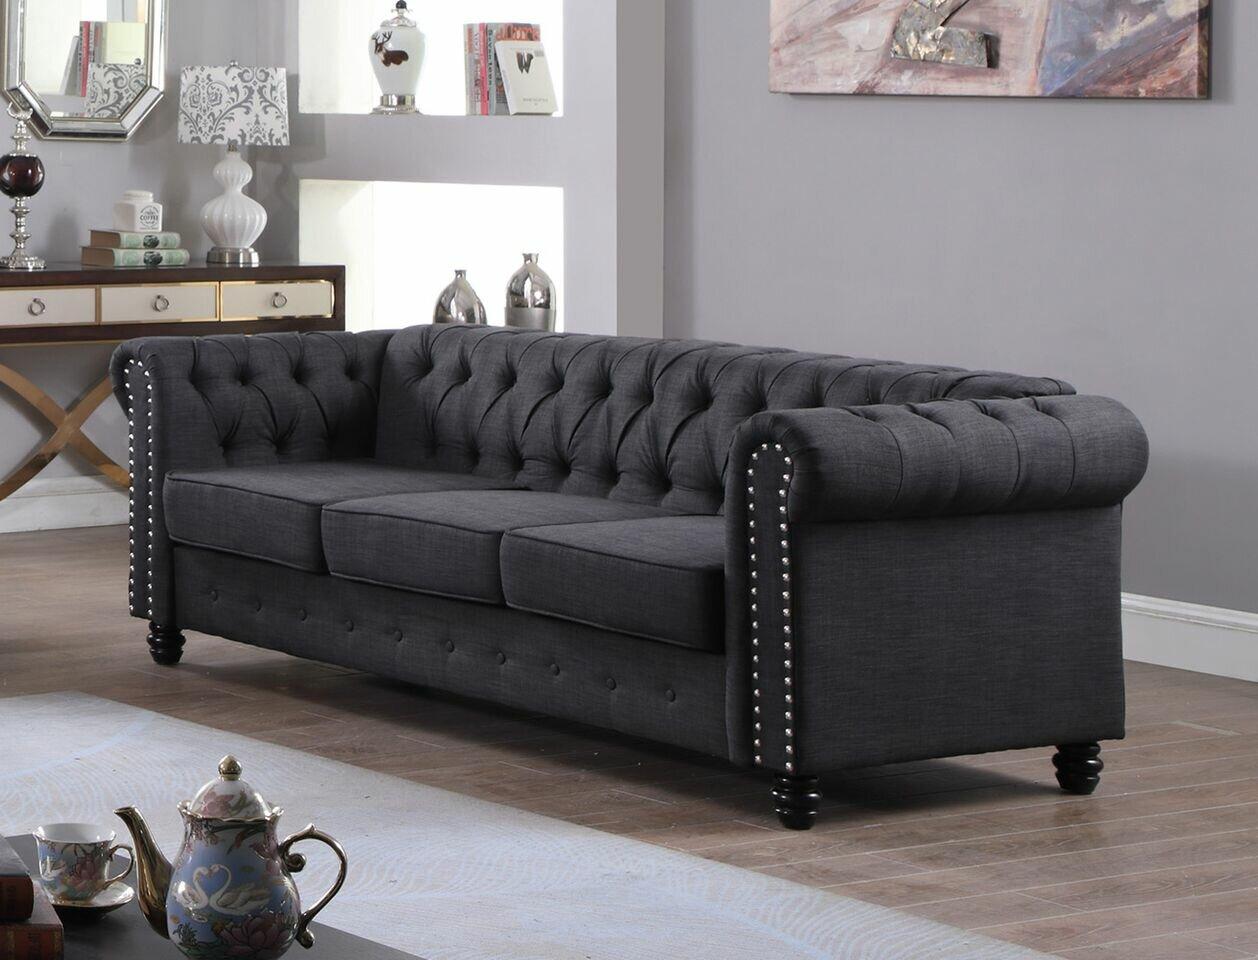 Sensational Altman Fabric Modern Living Room Sofa Best Image Libraries Thycampuscom